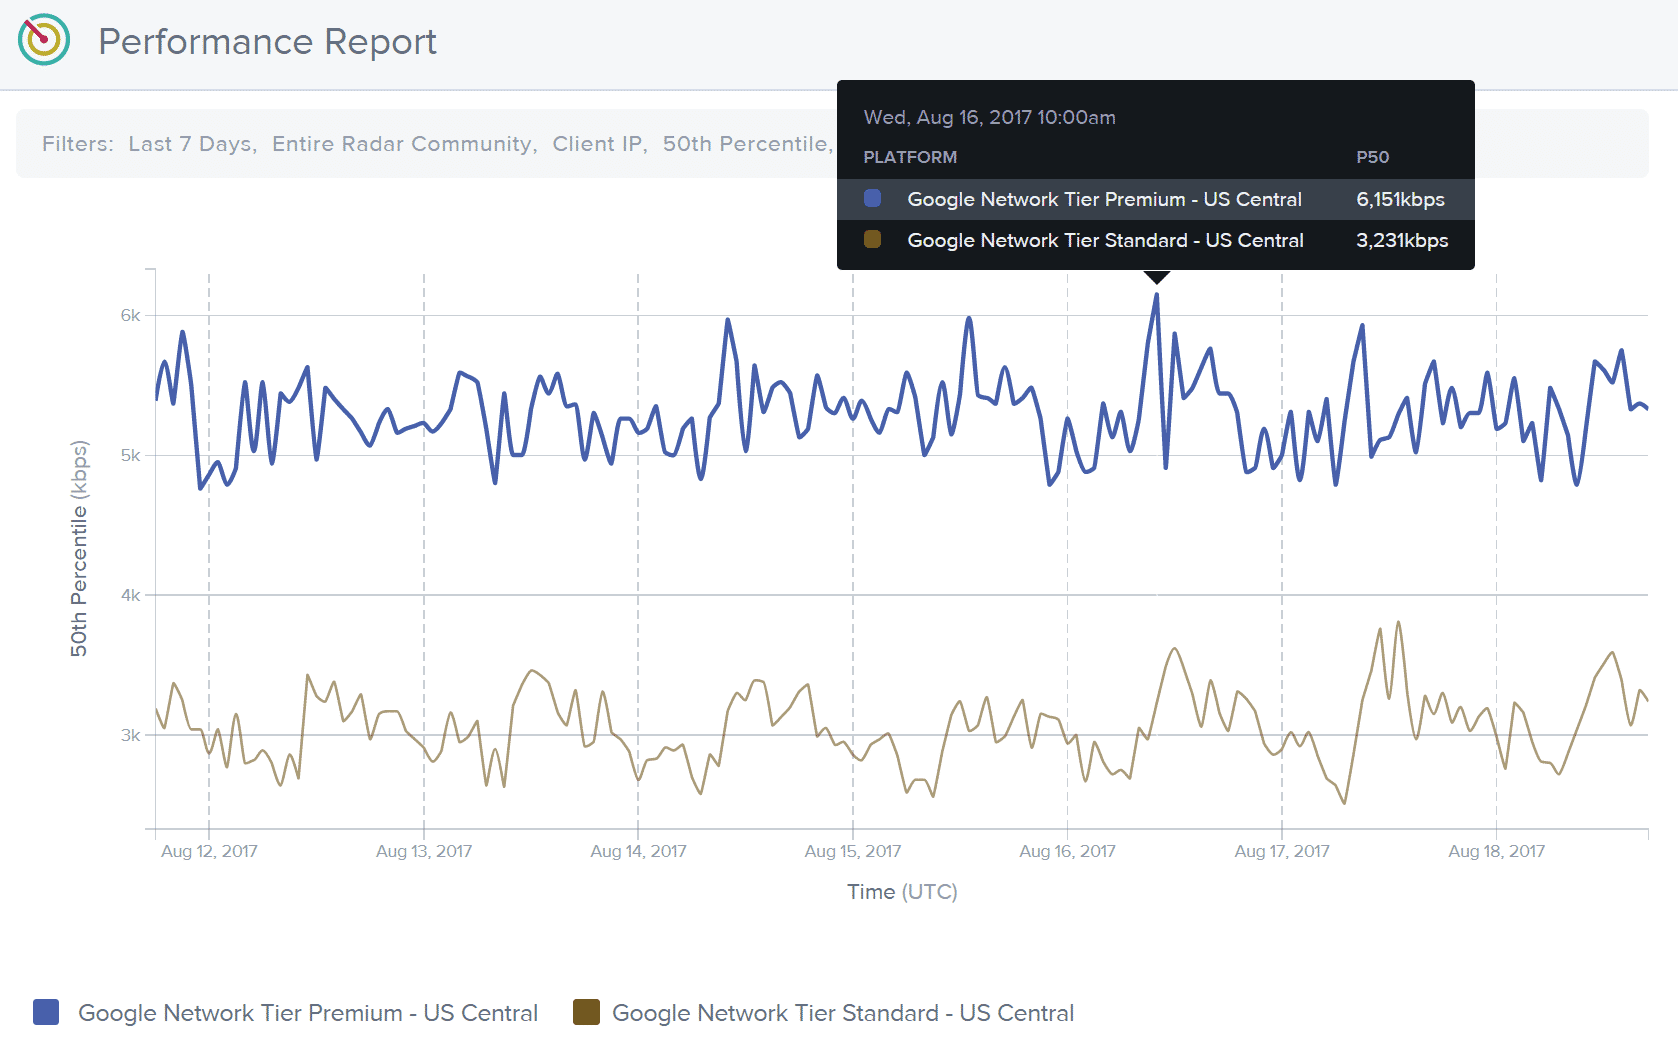 Google Cloud Premium niveau doorvoer versus standaard niveau